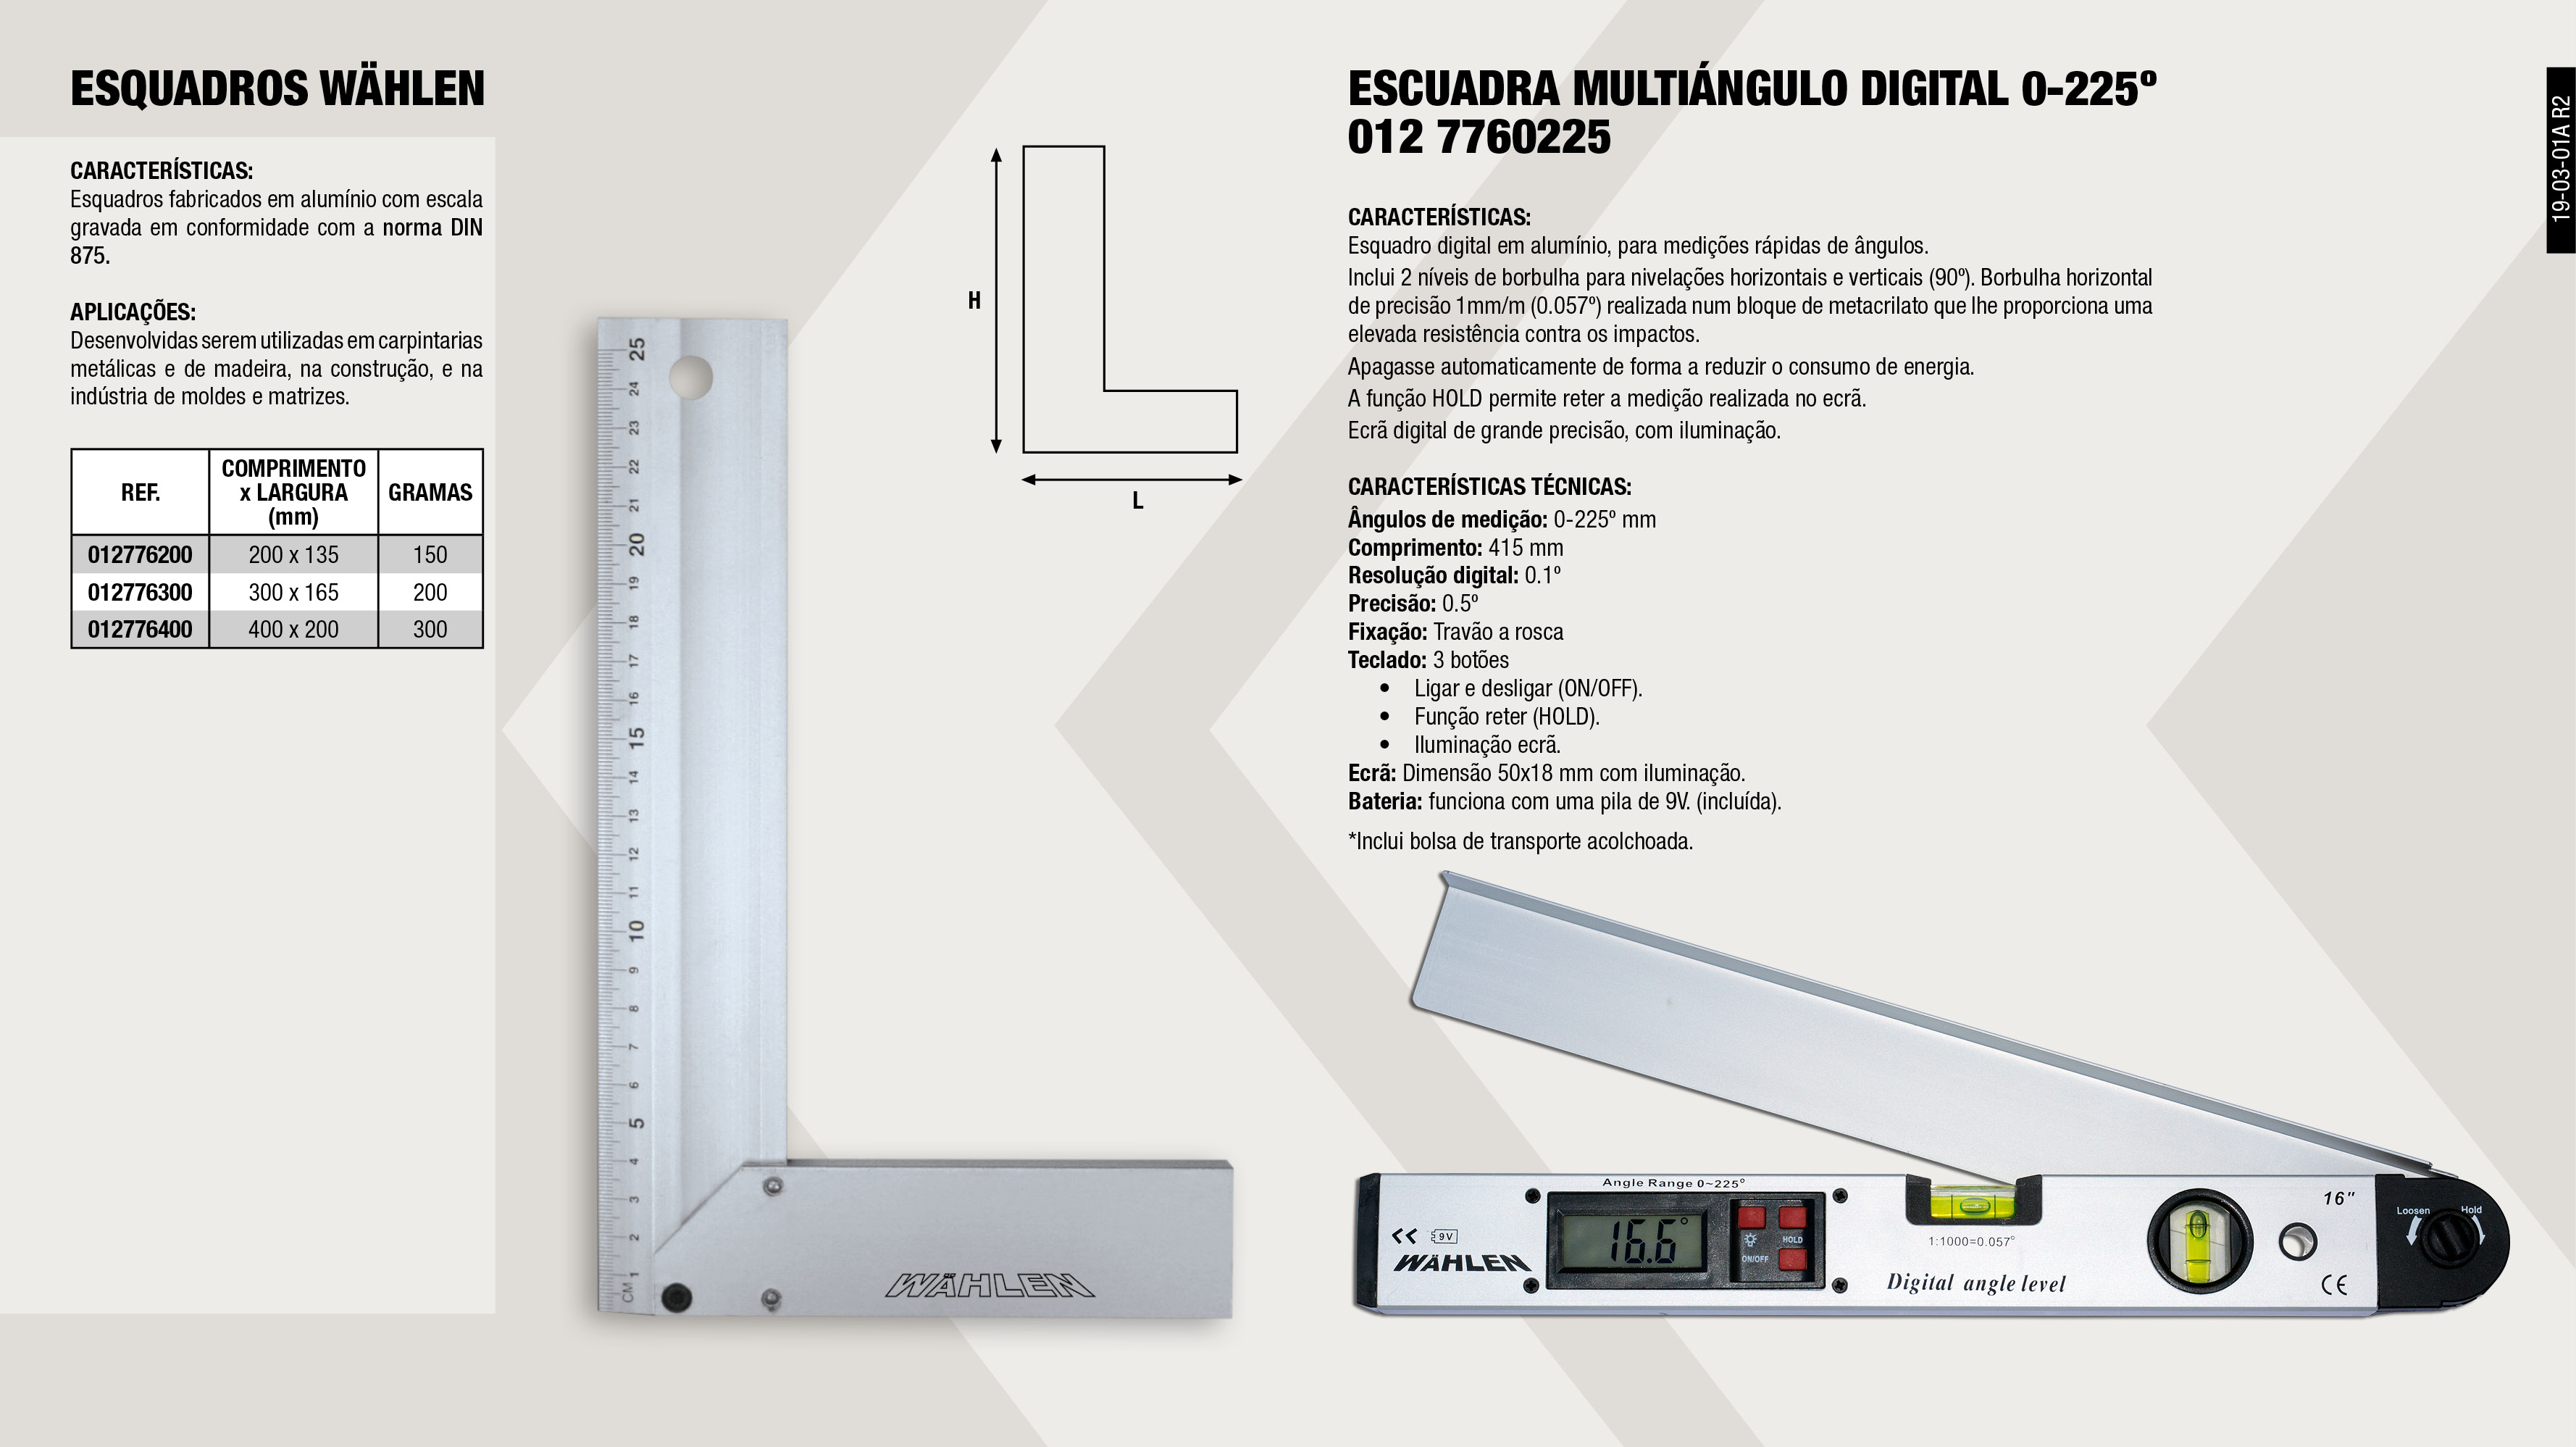 ESQUADRO MULTIANGULO DIGITAL 0-225º                         ,  ESQUADRO DE ALUMINIO 300 MM                                 ,  ESQUADRO DE ALUMINIO 200 MM                                 ,  ESQUADRO DE ALUMINIO 400 MM                                 ,